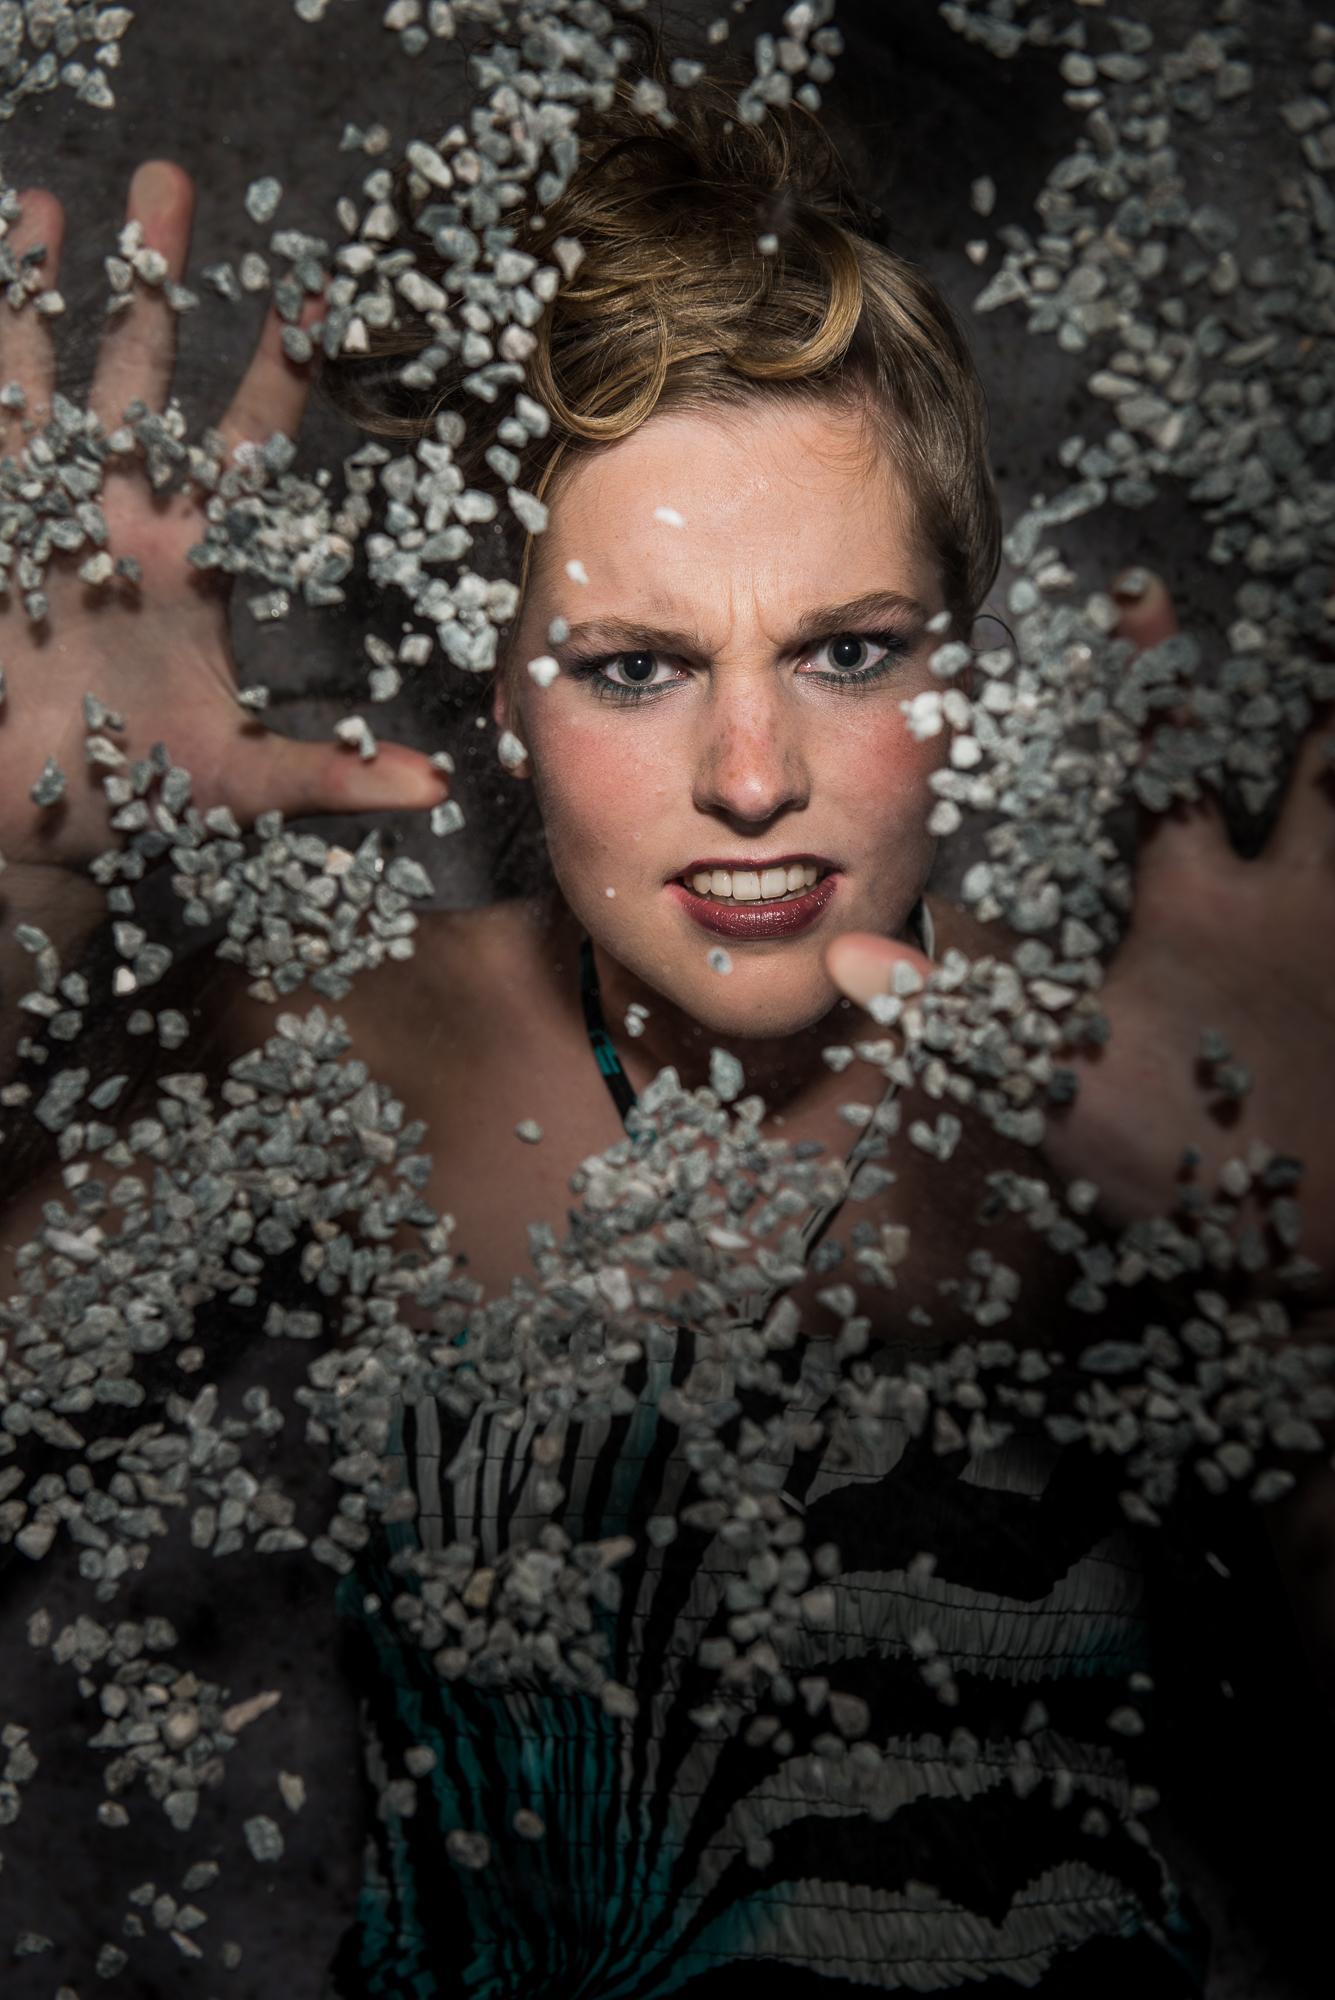 Behind Glass; Hilde